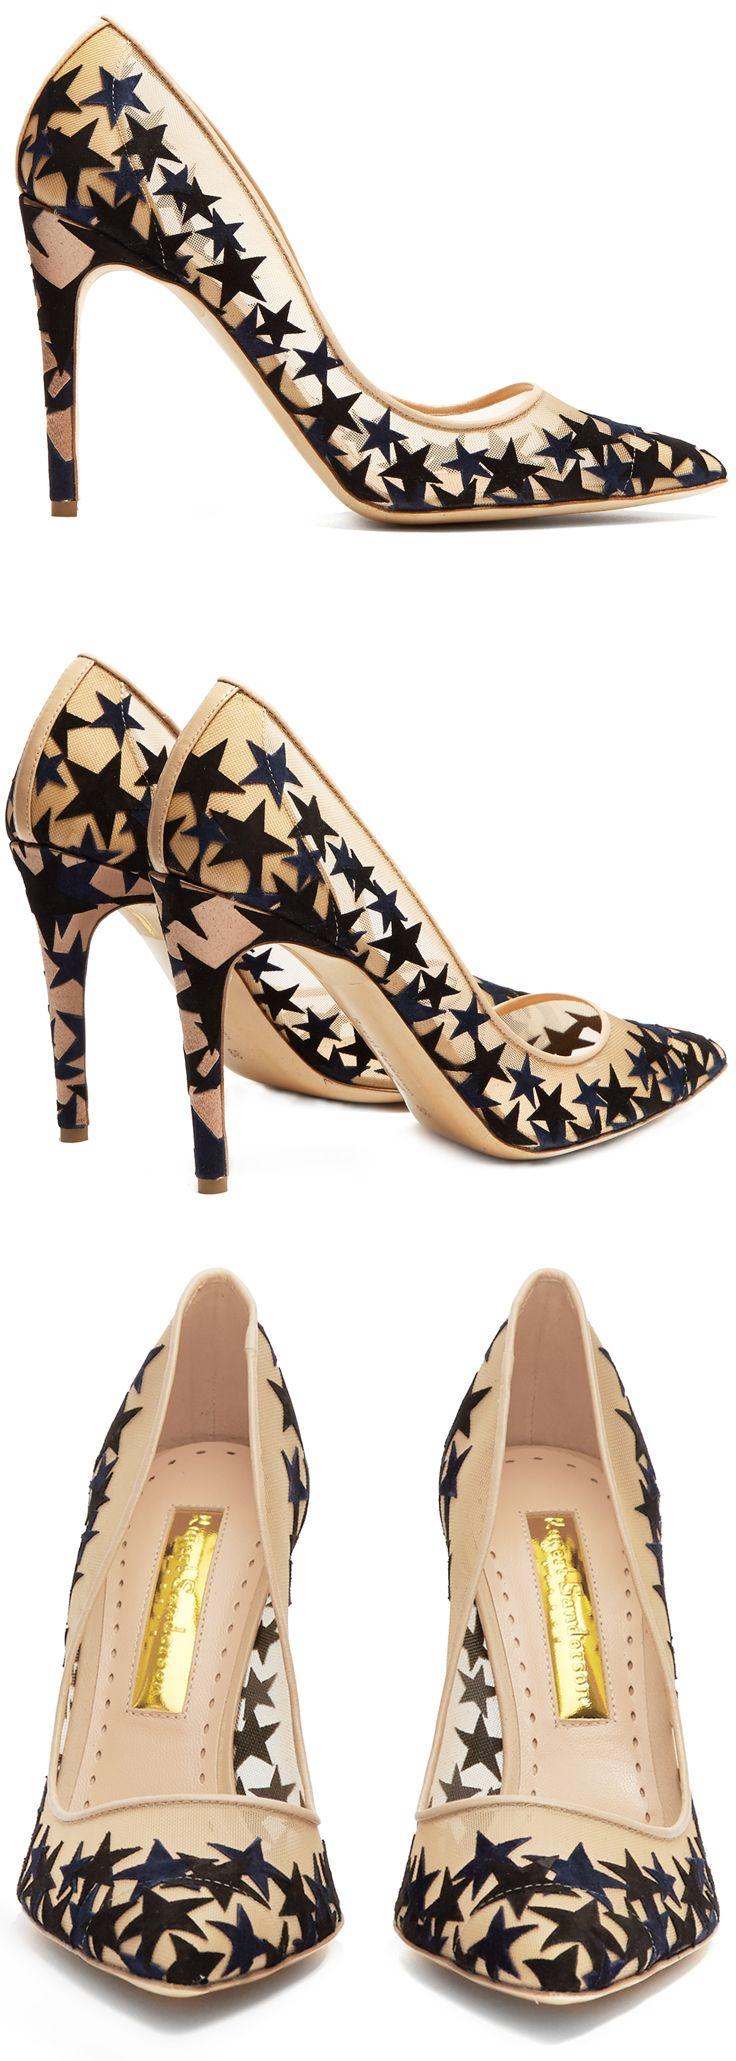 rupert sanderson star shoes